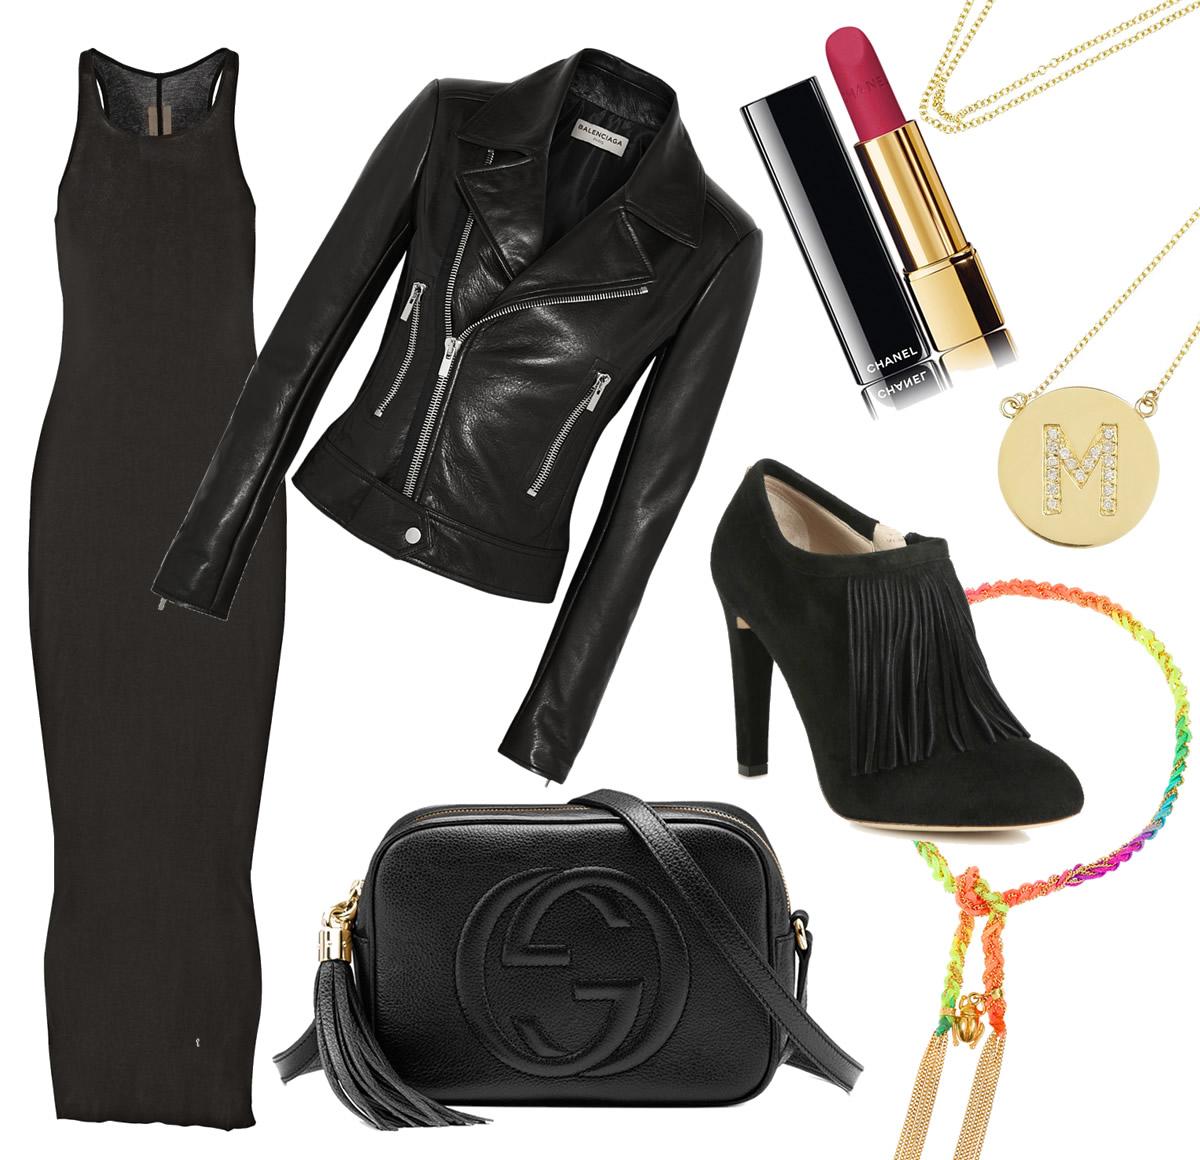 Gucci Soho Disco Bag Look 2